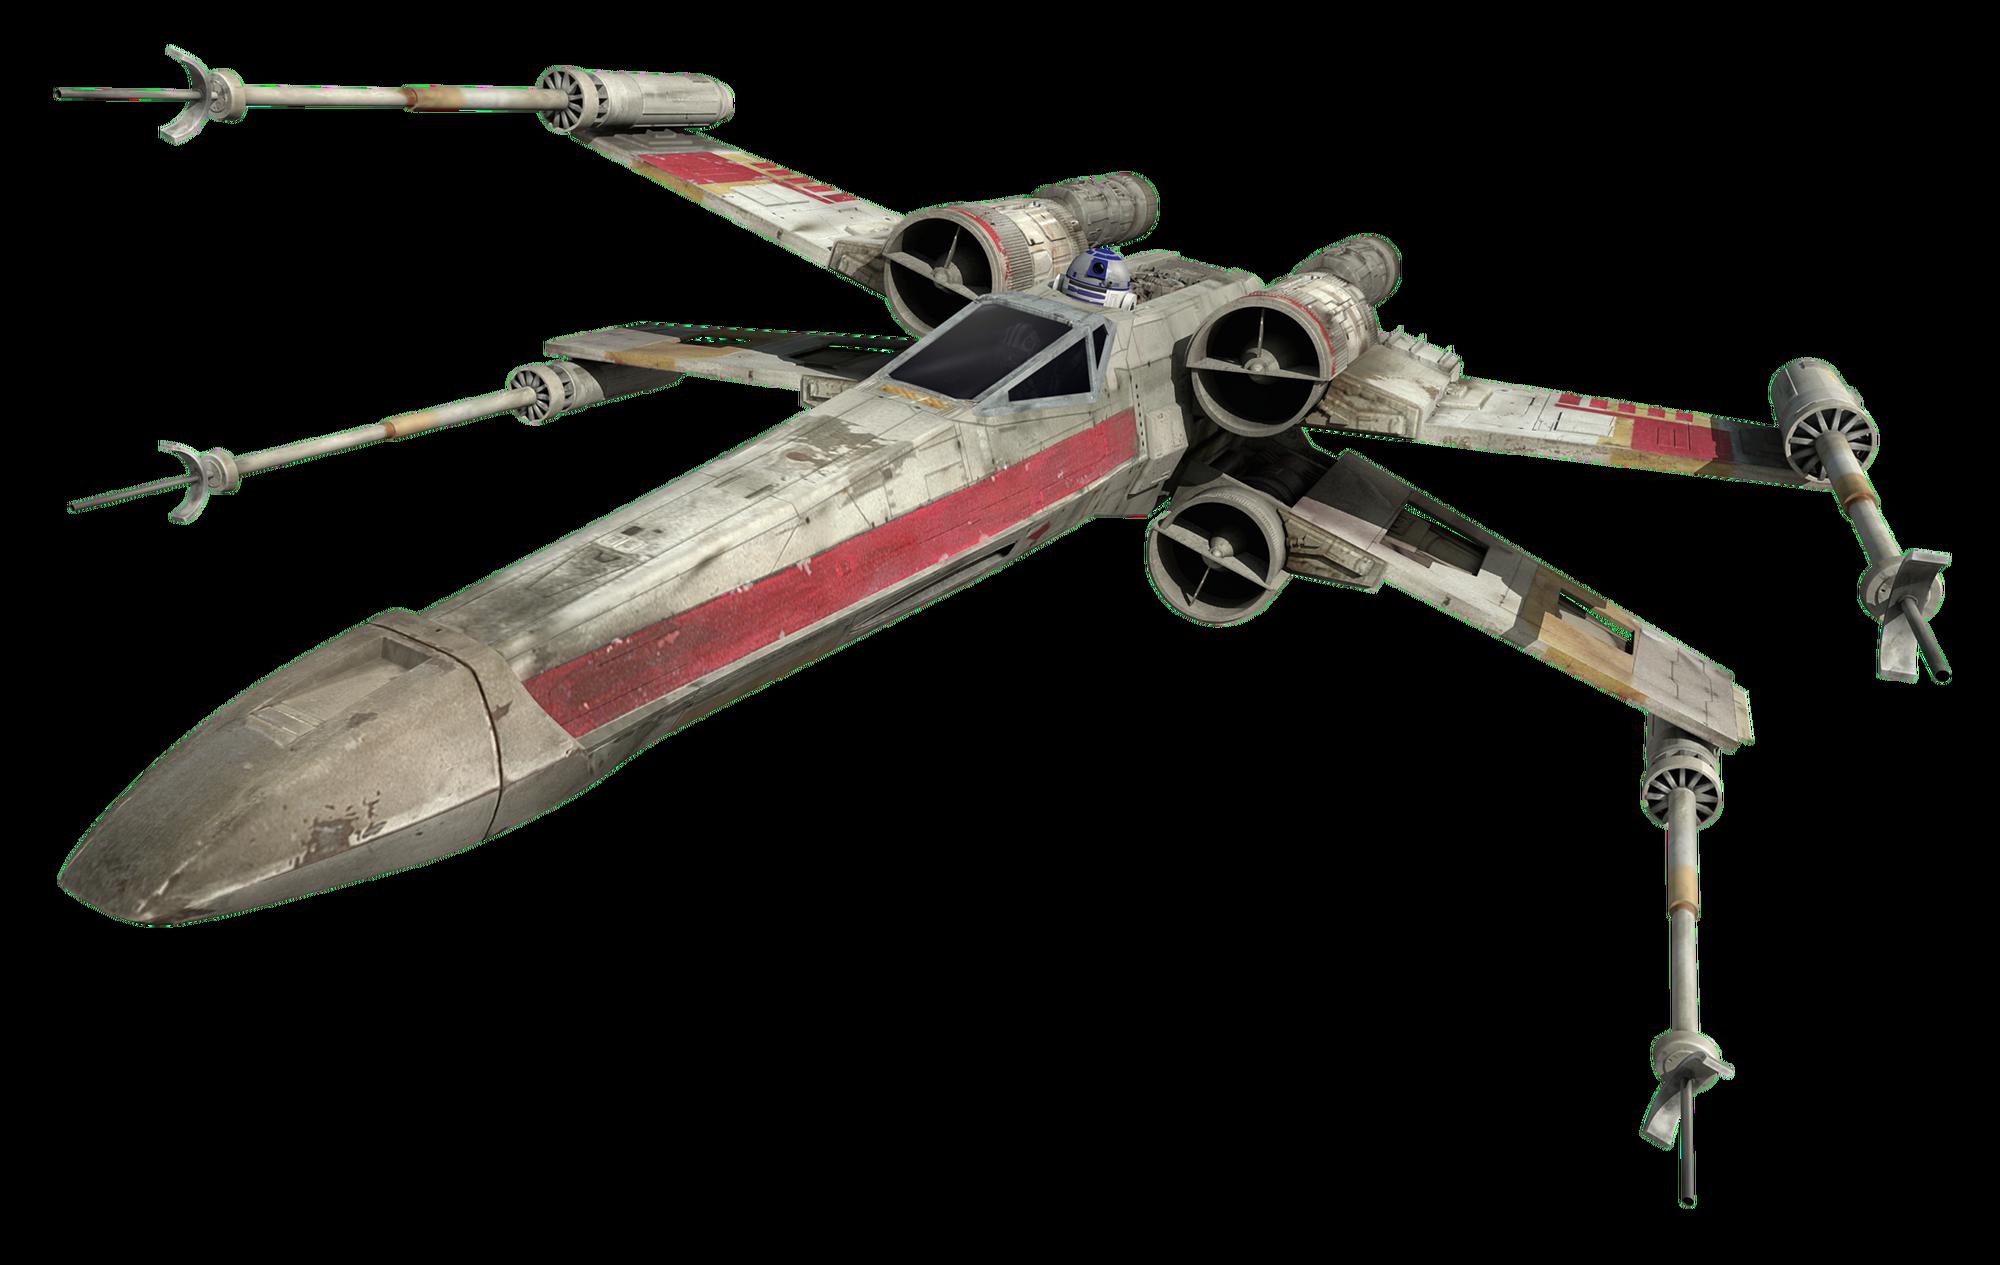 T 65 X Wing Starfighter Wookieepedia Fandom Powered By Wikia